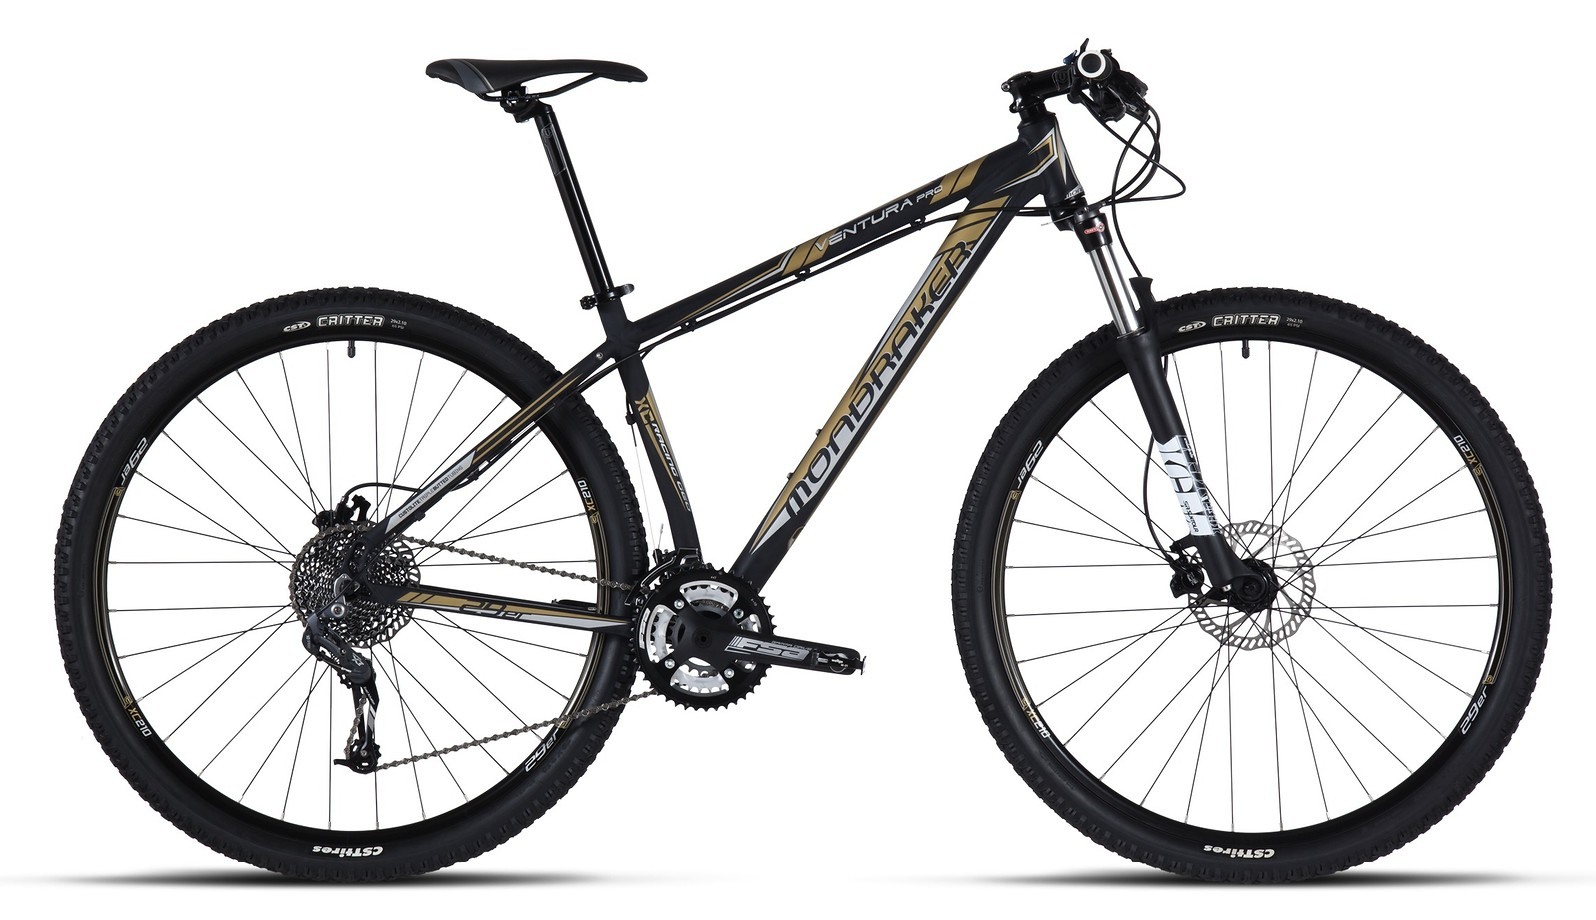 2013 Mondraker Ventura Pro 29er Bike bike - mondraker ventura pro 29er